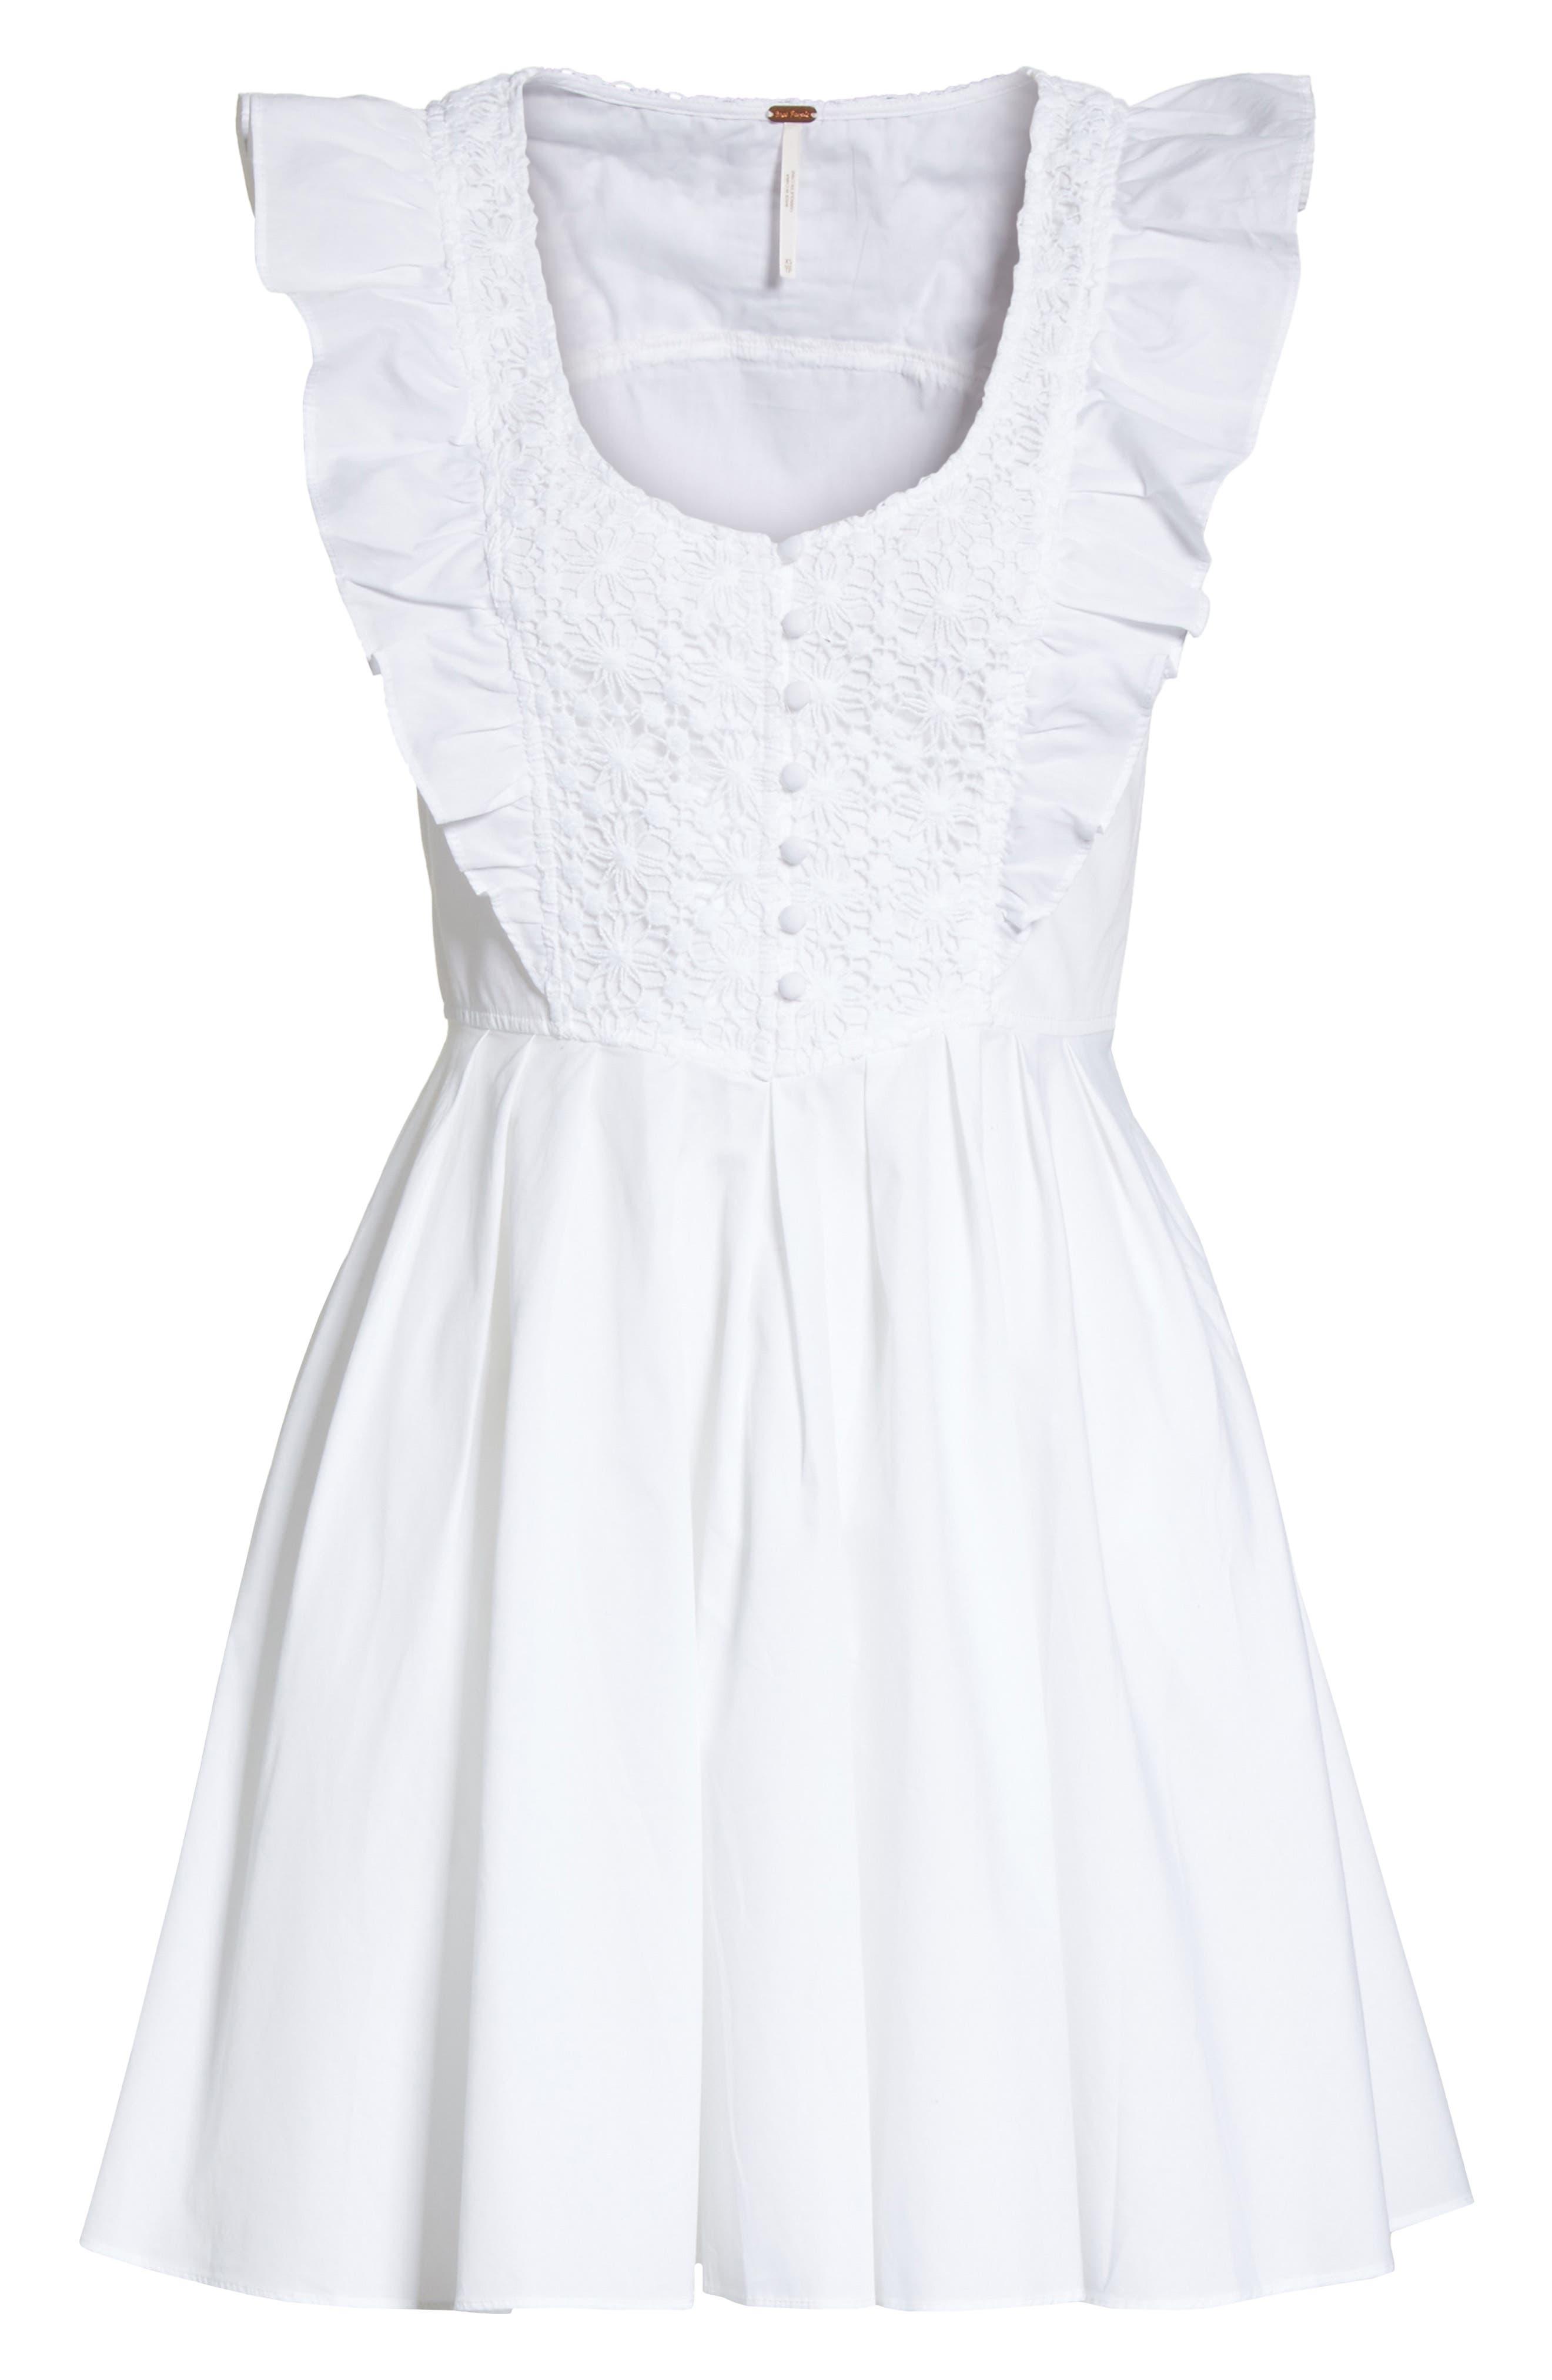 Half Moon Minidress,                             Alternate thumbnail 6, color,                             White